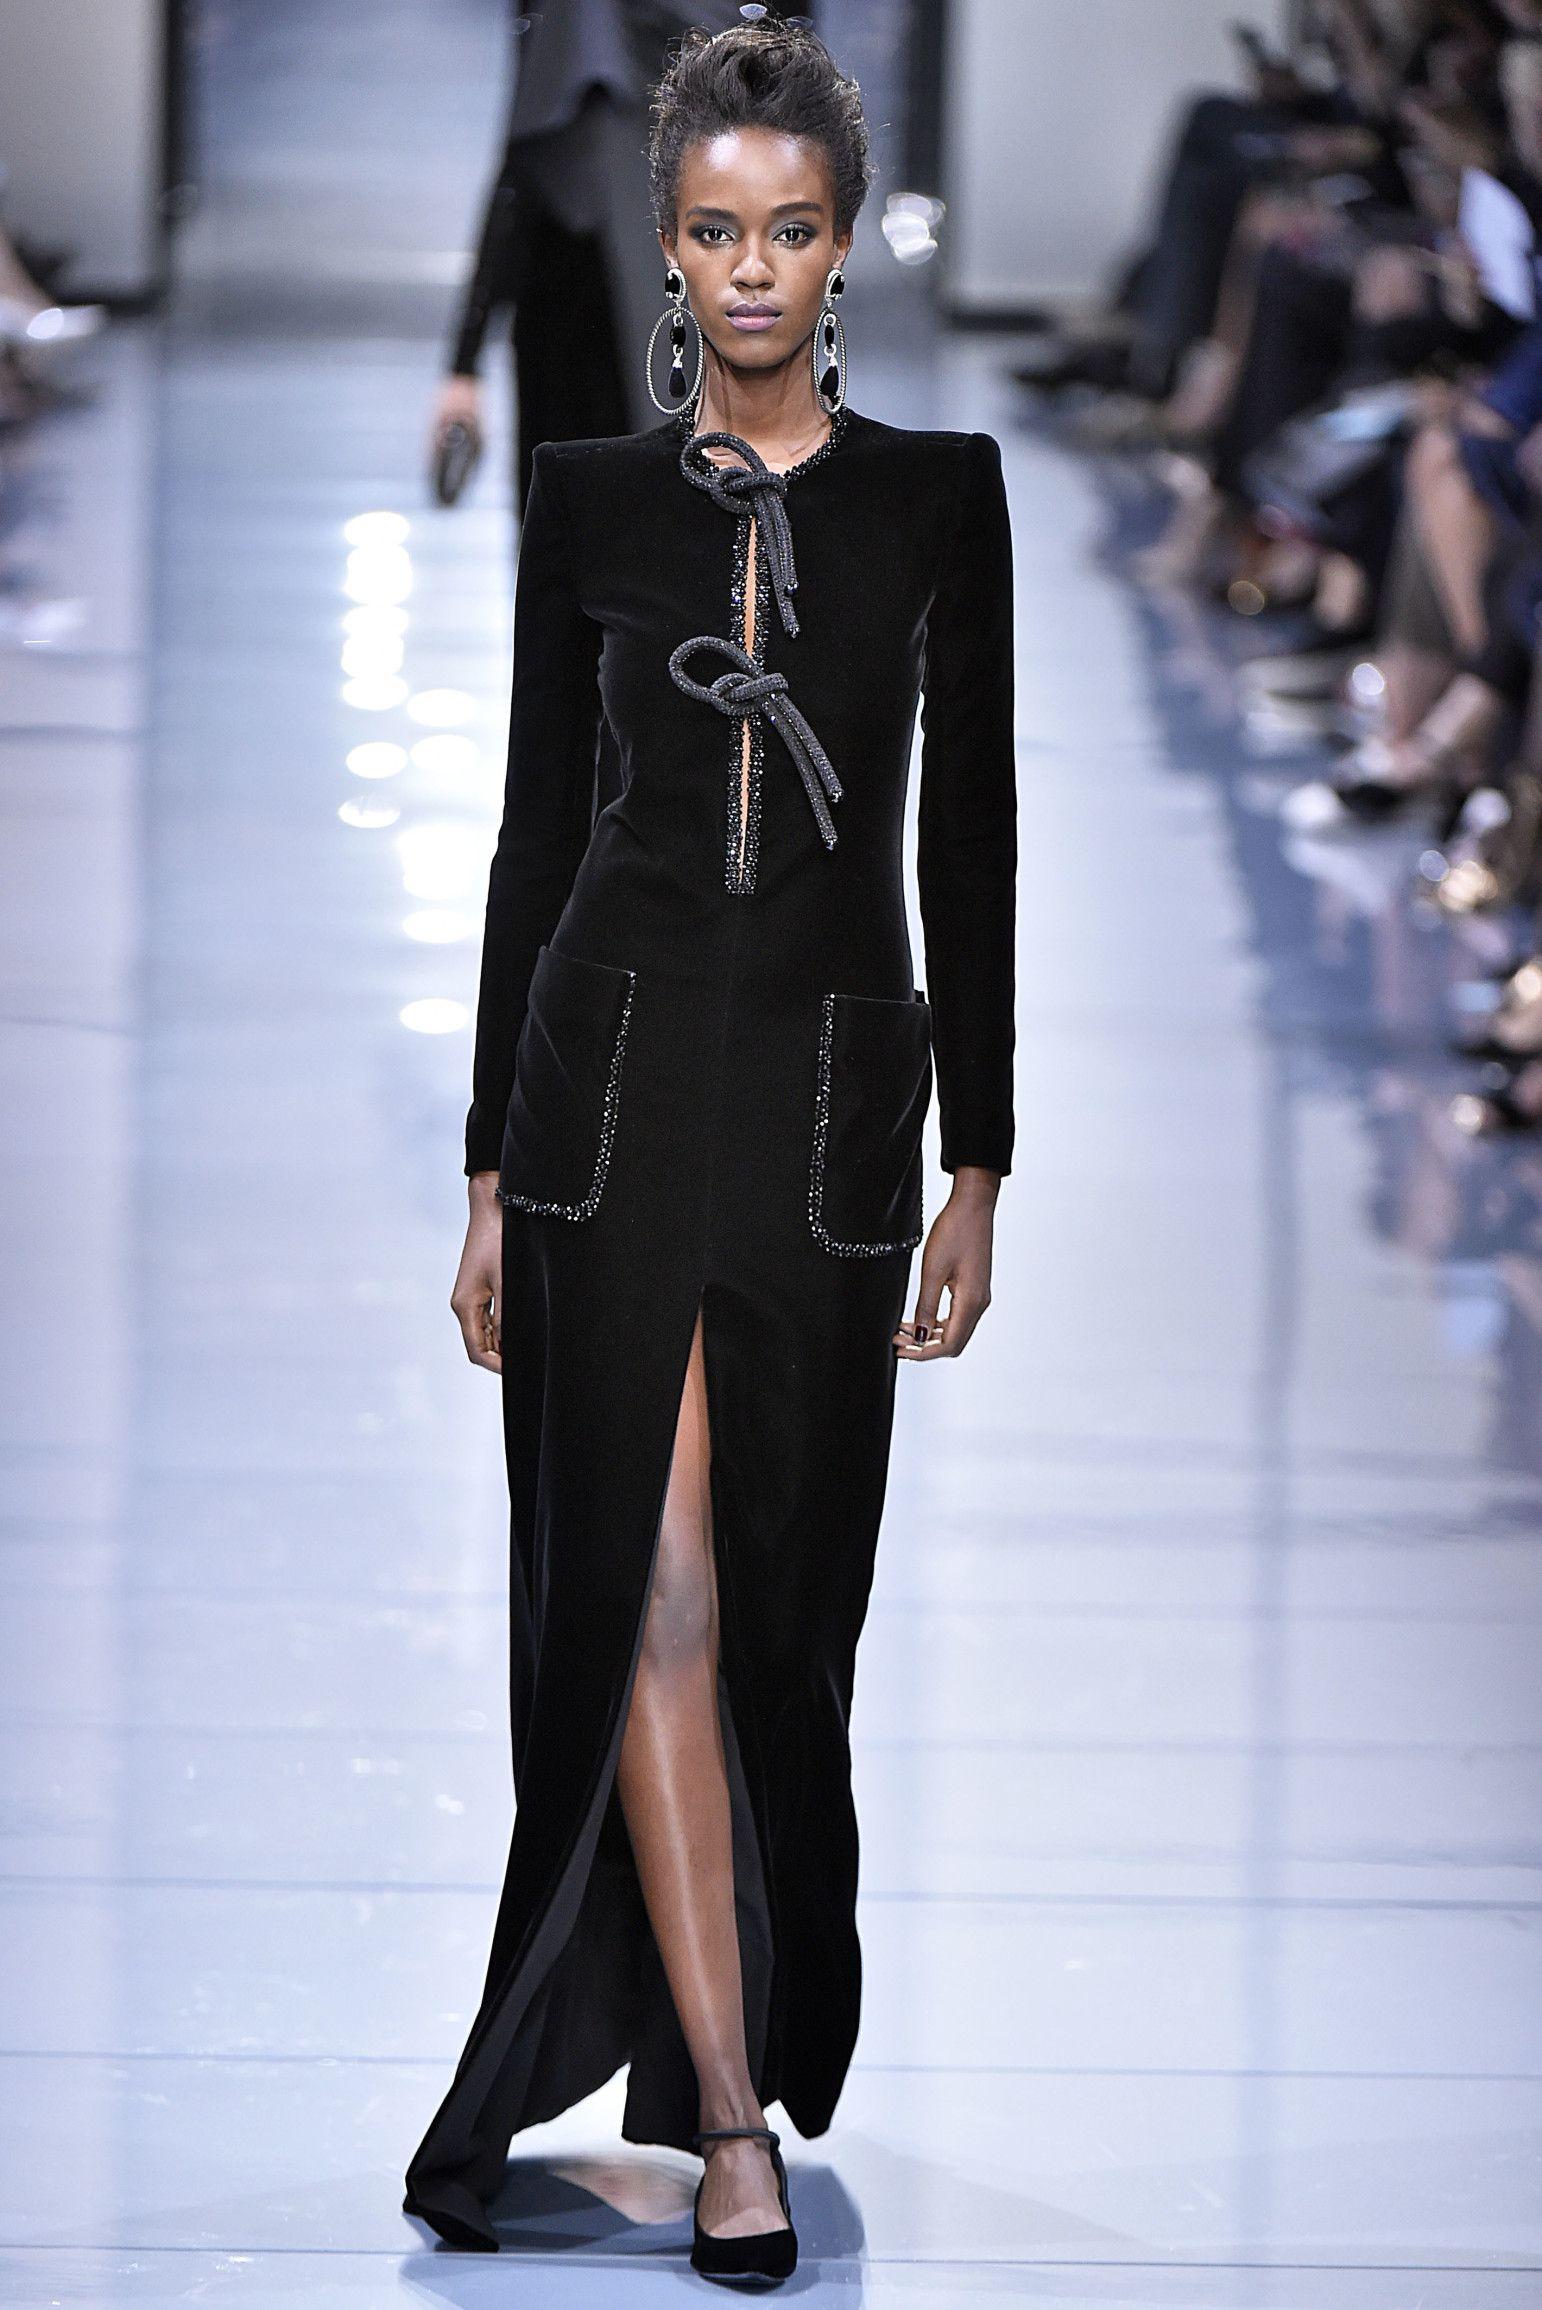 Christian Siriano Spring 2020 Ready To Wear Fashion Show In 2020 Celine Dion Christian Siriano Celine